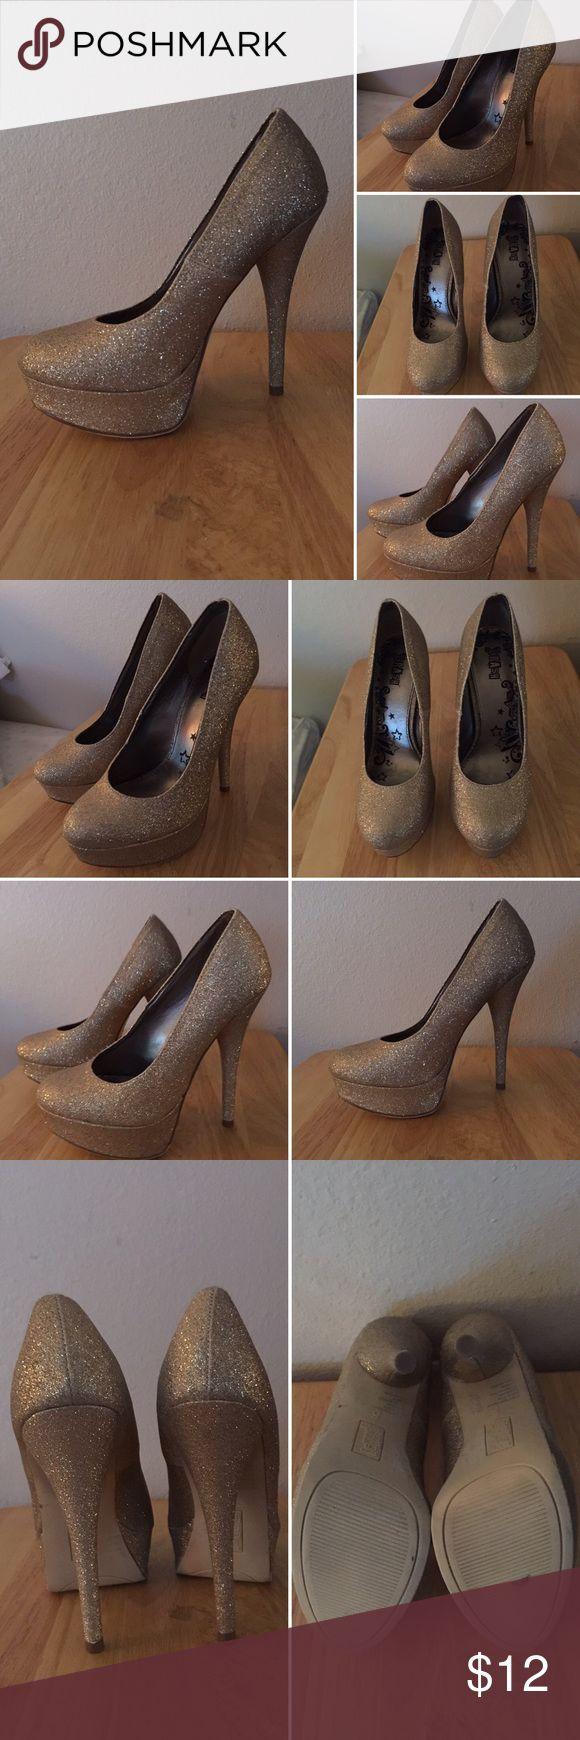 Brash Glittery Gold Stilettos Brash glittery gold stilettos. Size 5. Brash Shoes Heels